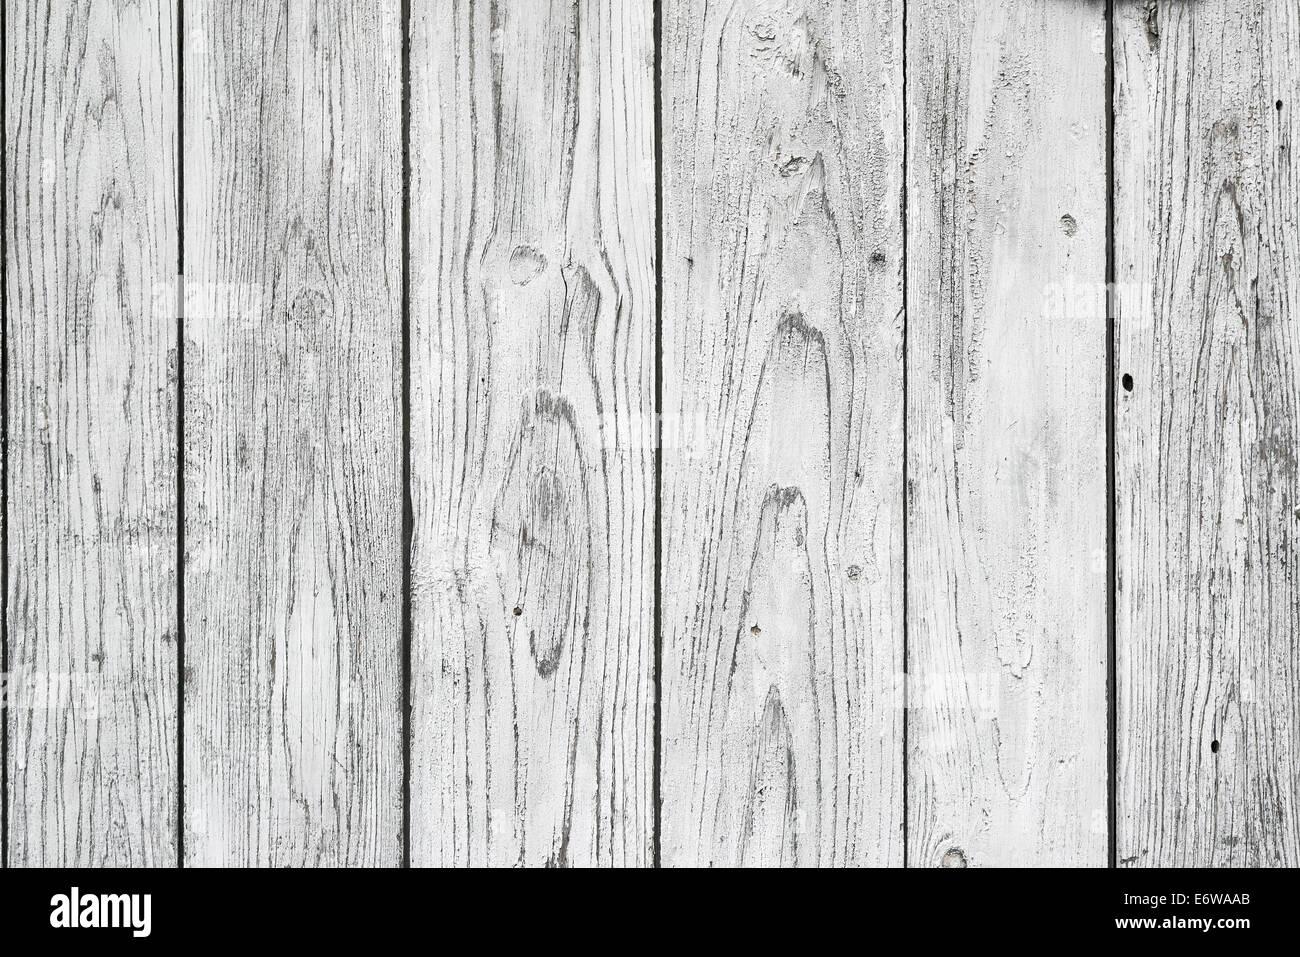 White Wood Planks Texture As Background Stock Photo